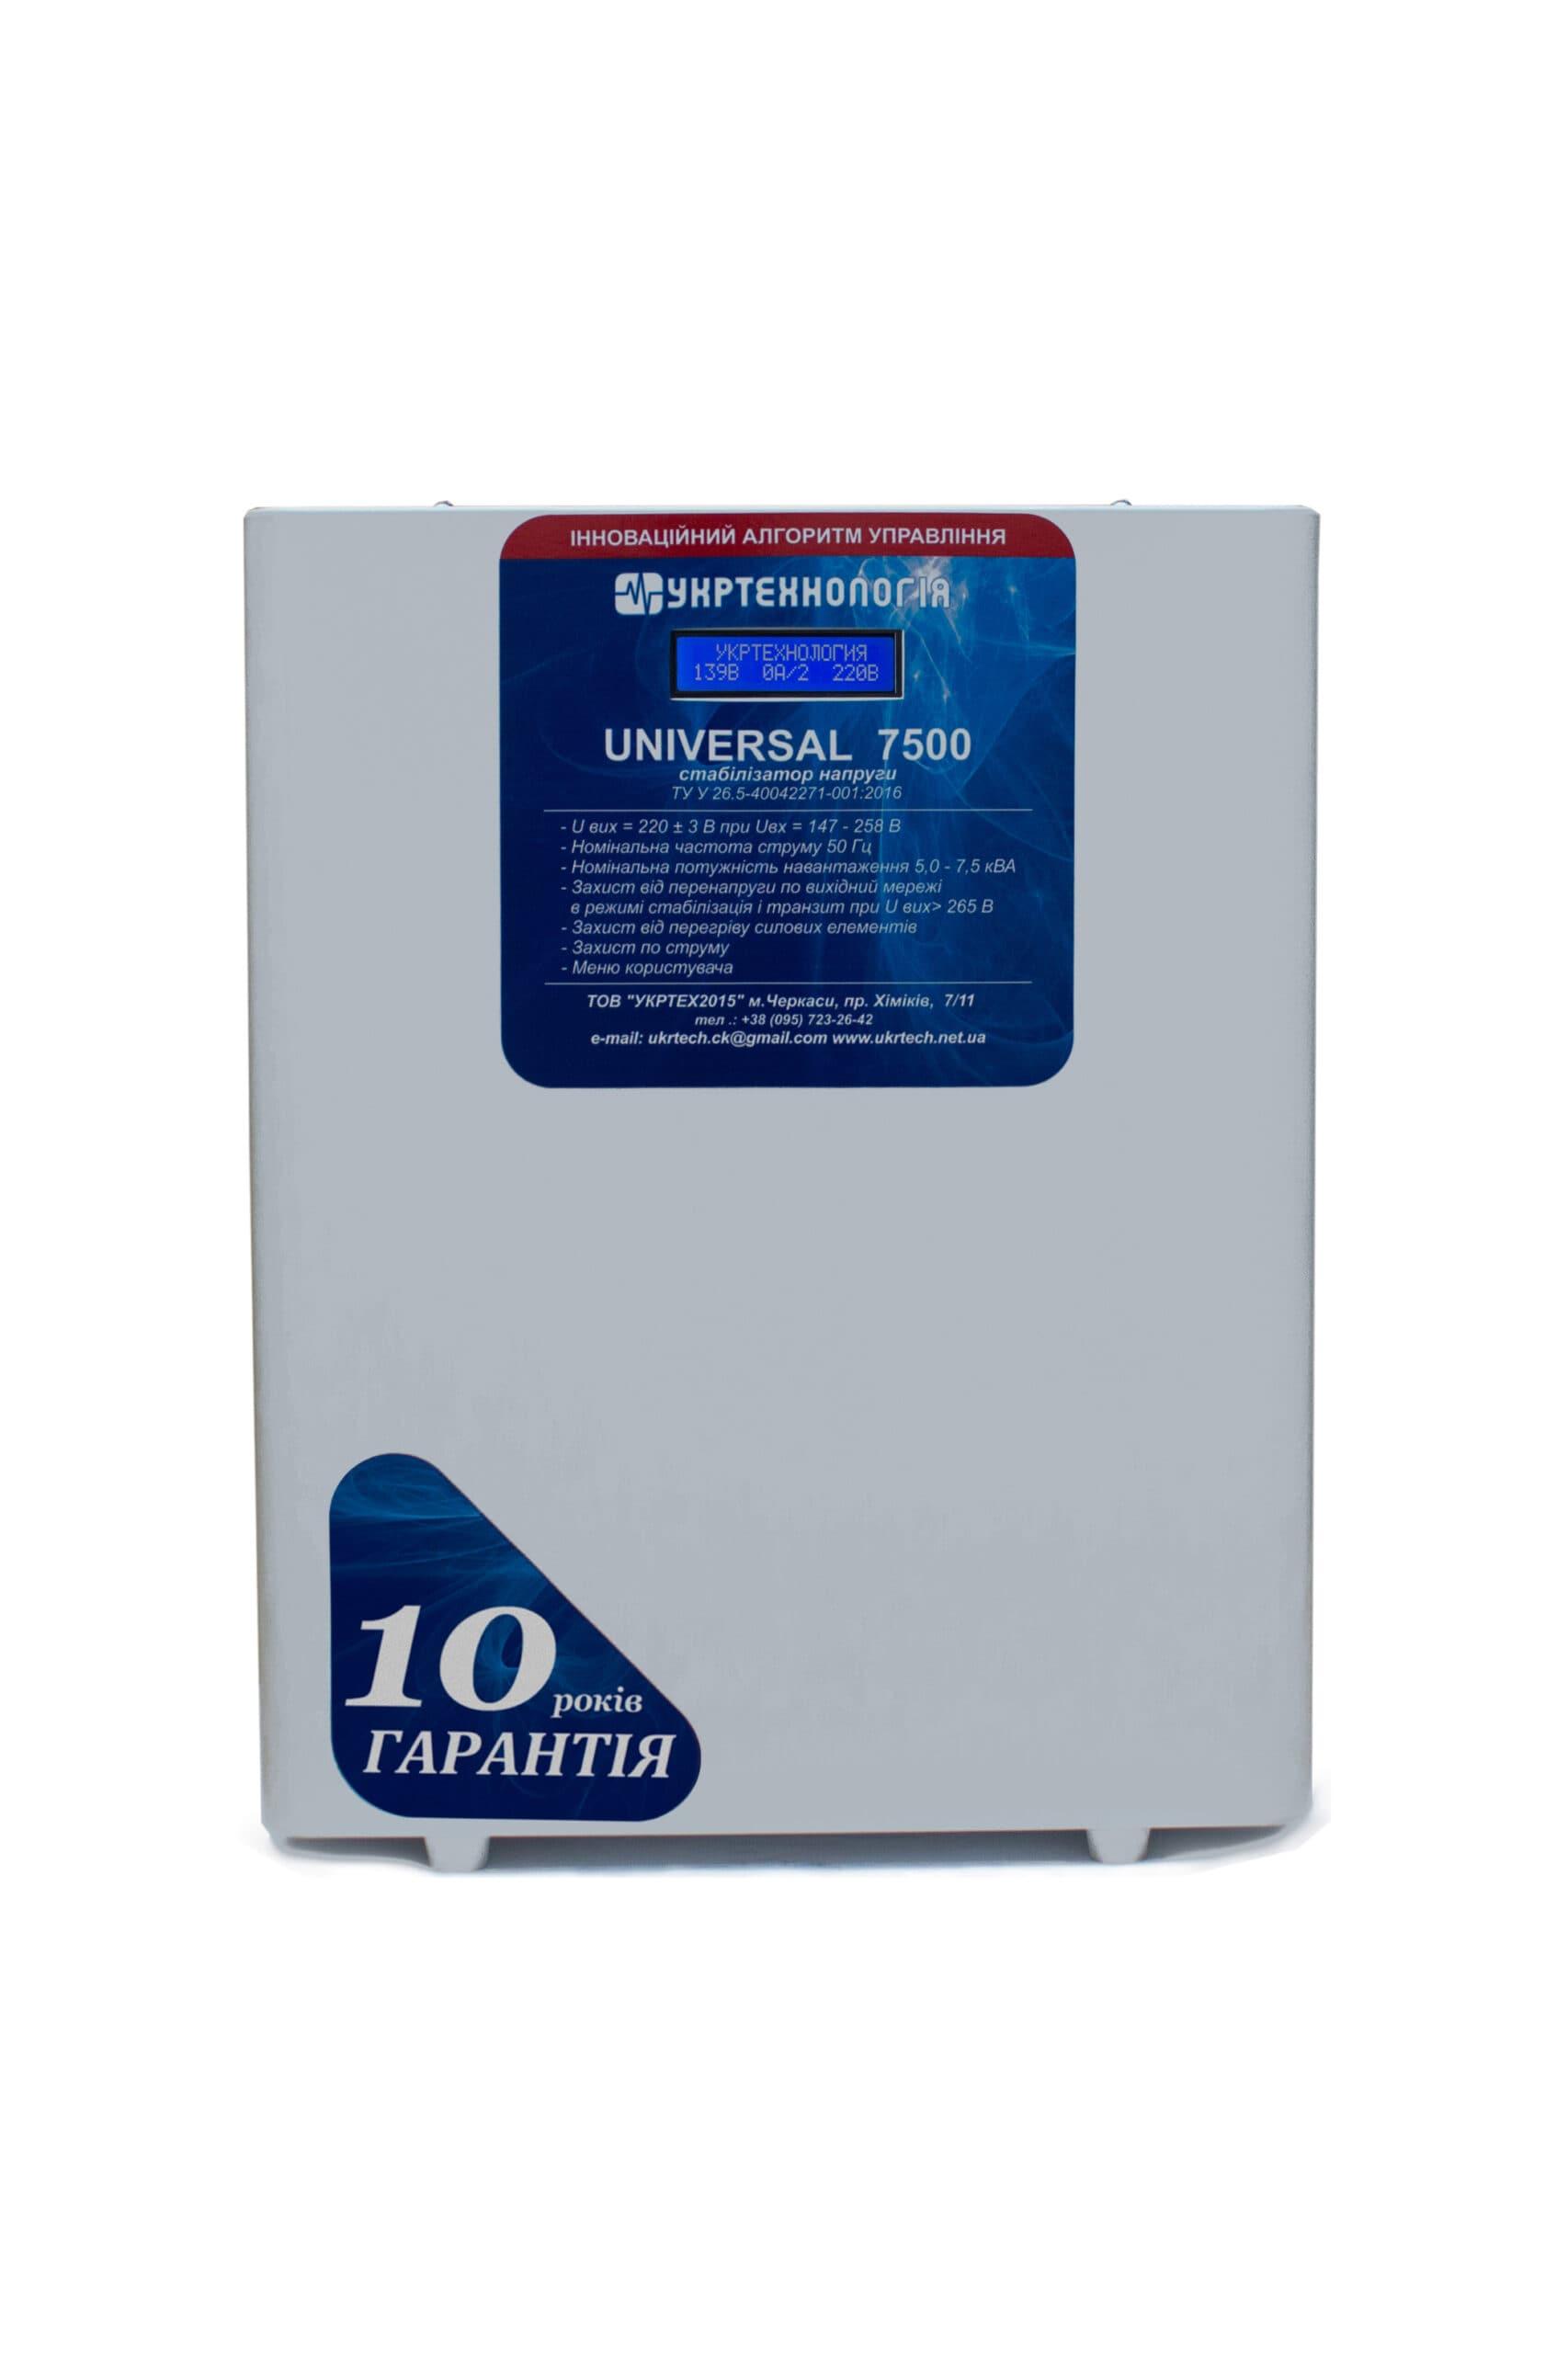 Стабилизаторы напряжения - Стабилизатор напряжения 7,5 кВт UNIVERSAL 000001418 - Фото 2